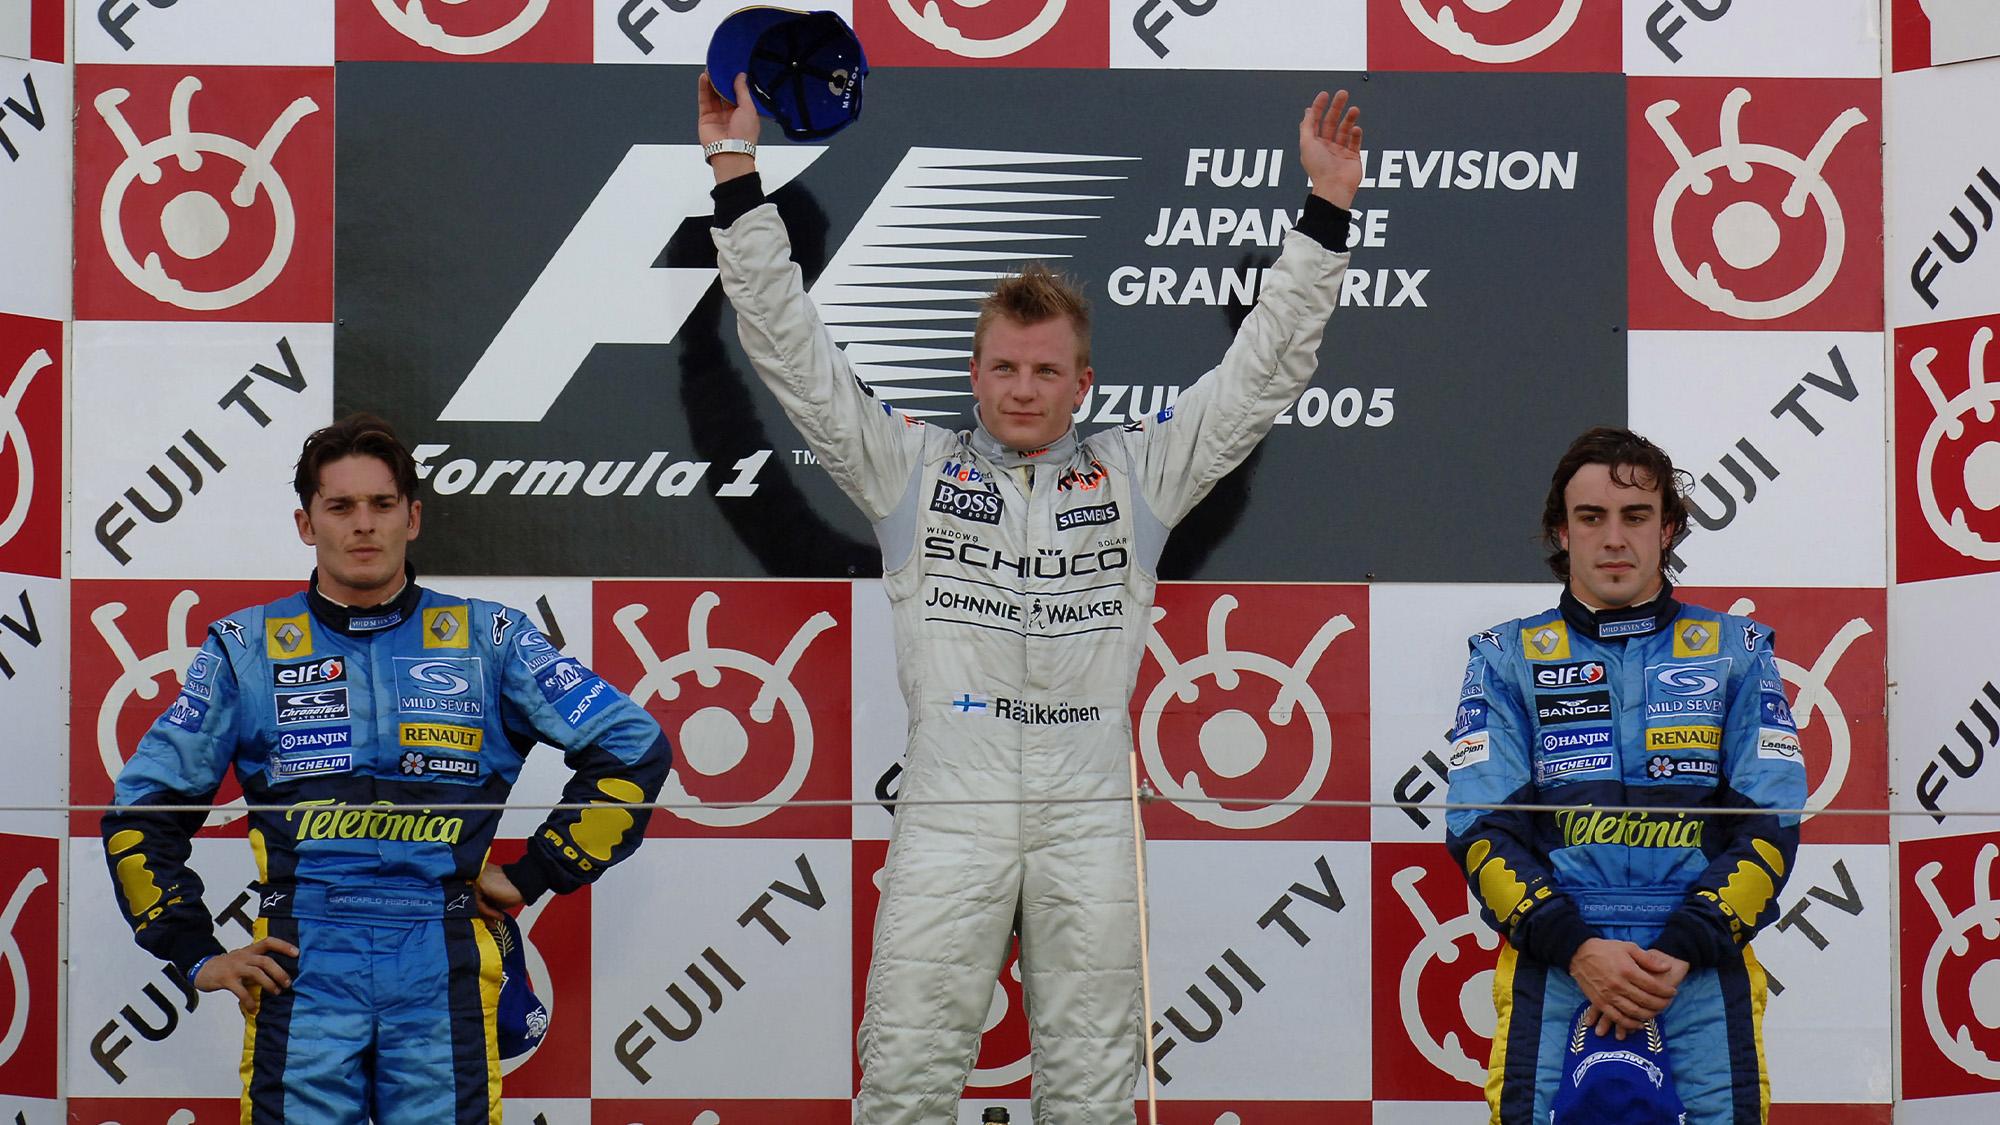 Kimi Raikkonen on the podium alongside Giancarlo Fisichella and Fernando Alonso after winning the 2005 F1 Japanese Grand prix at Suzuka